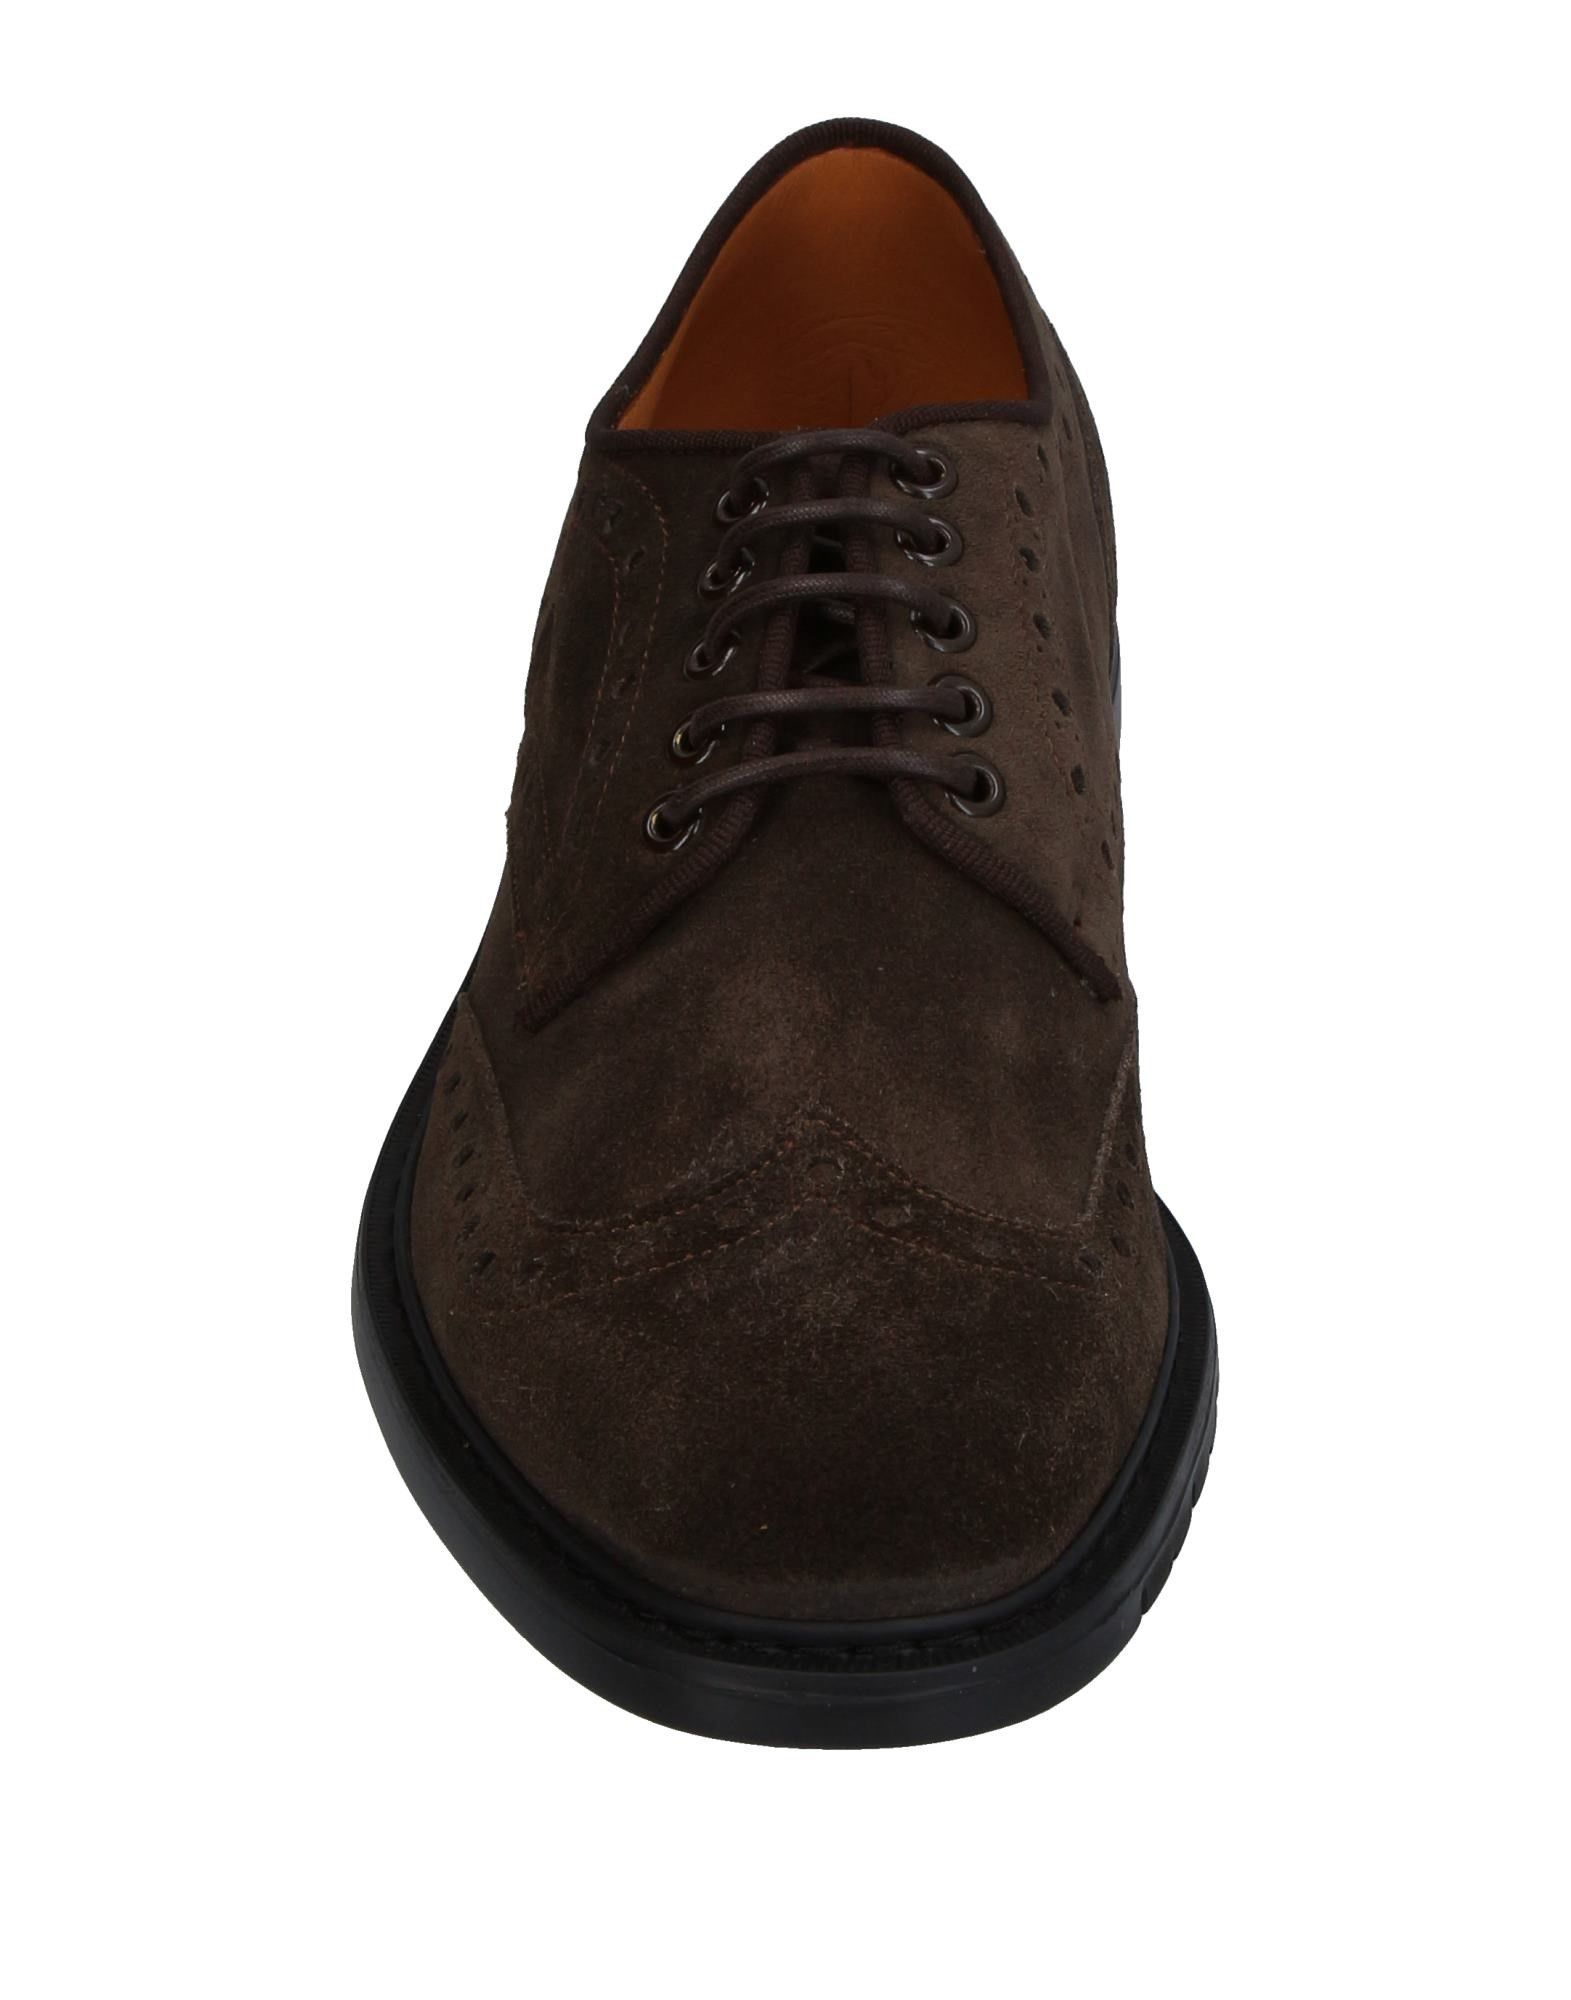 Fabi Schnürschuhe Herren  11387707DN Schuhe Heiße Schuhe 11387707DN b767c2